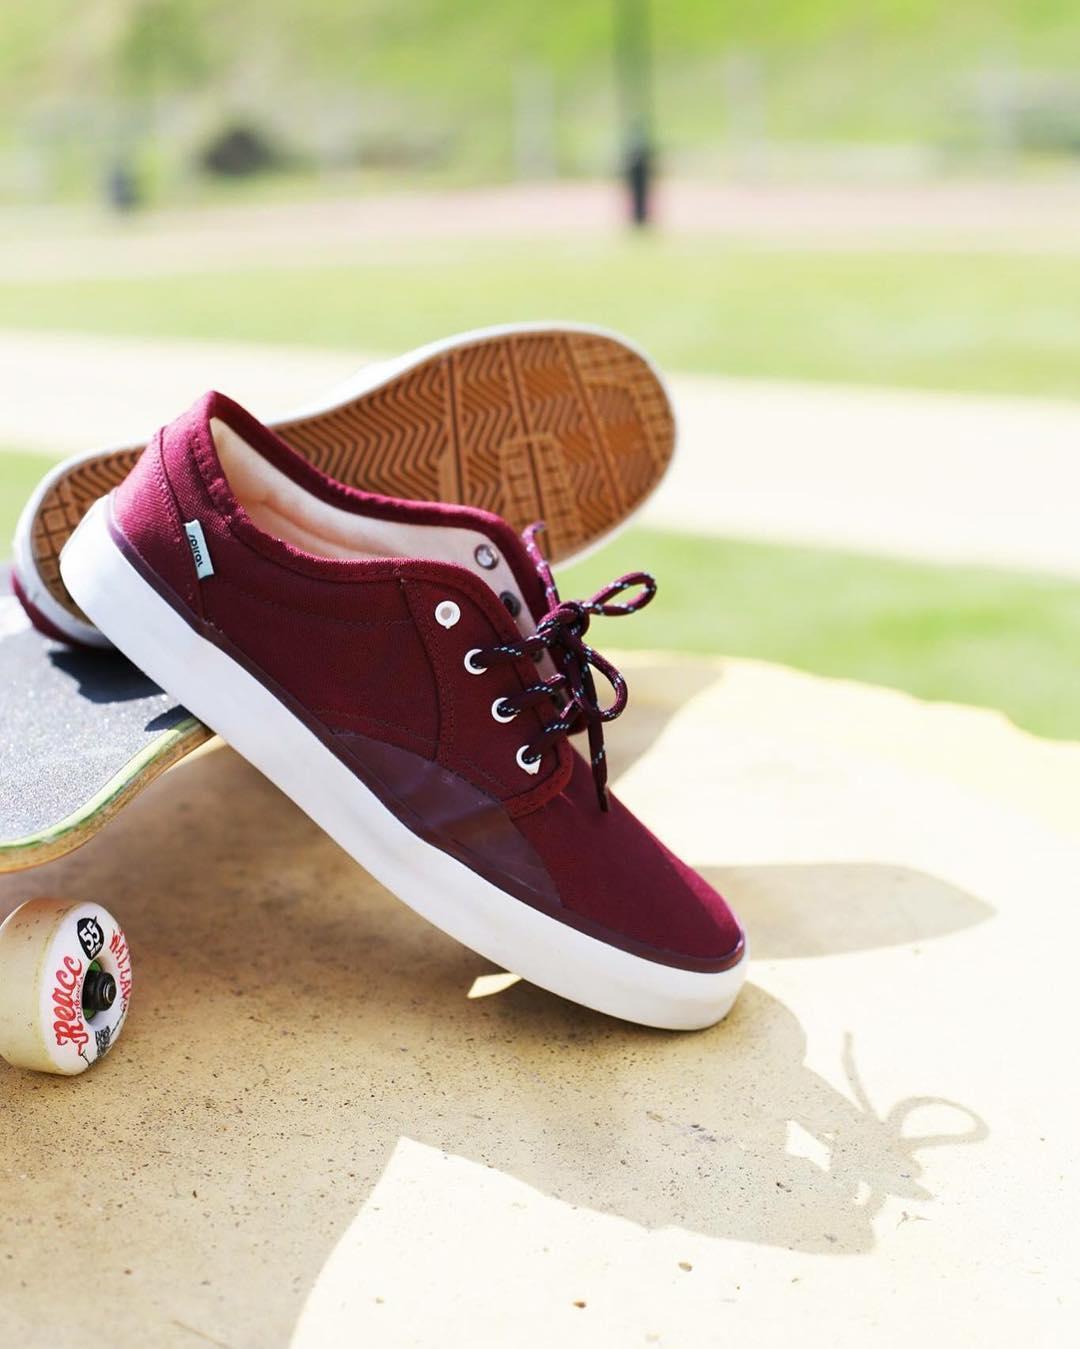 Spiral Shoes, Quality Shoes!  #Goskate #Skateboarding #Skateshoes #Skatelife